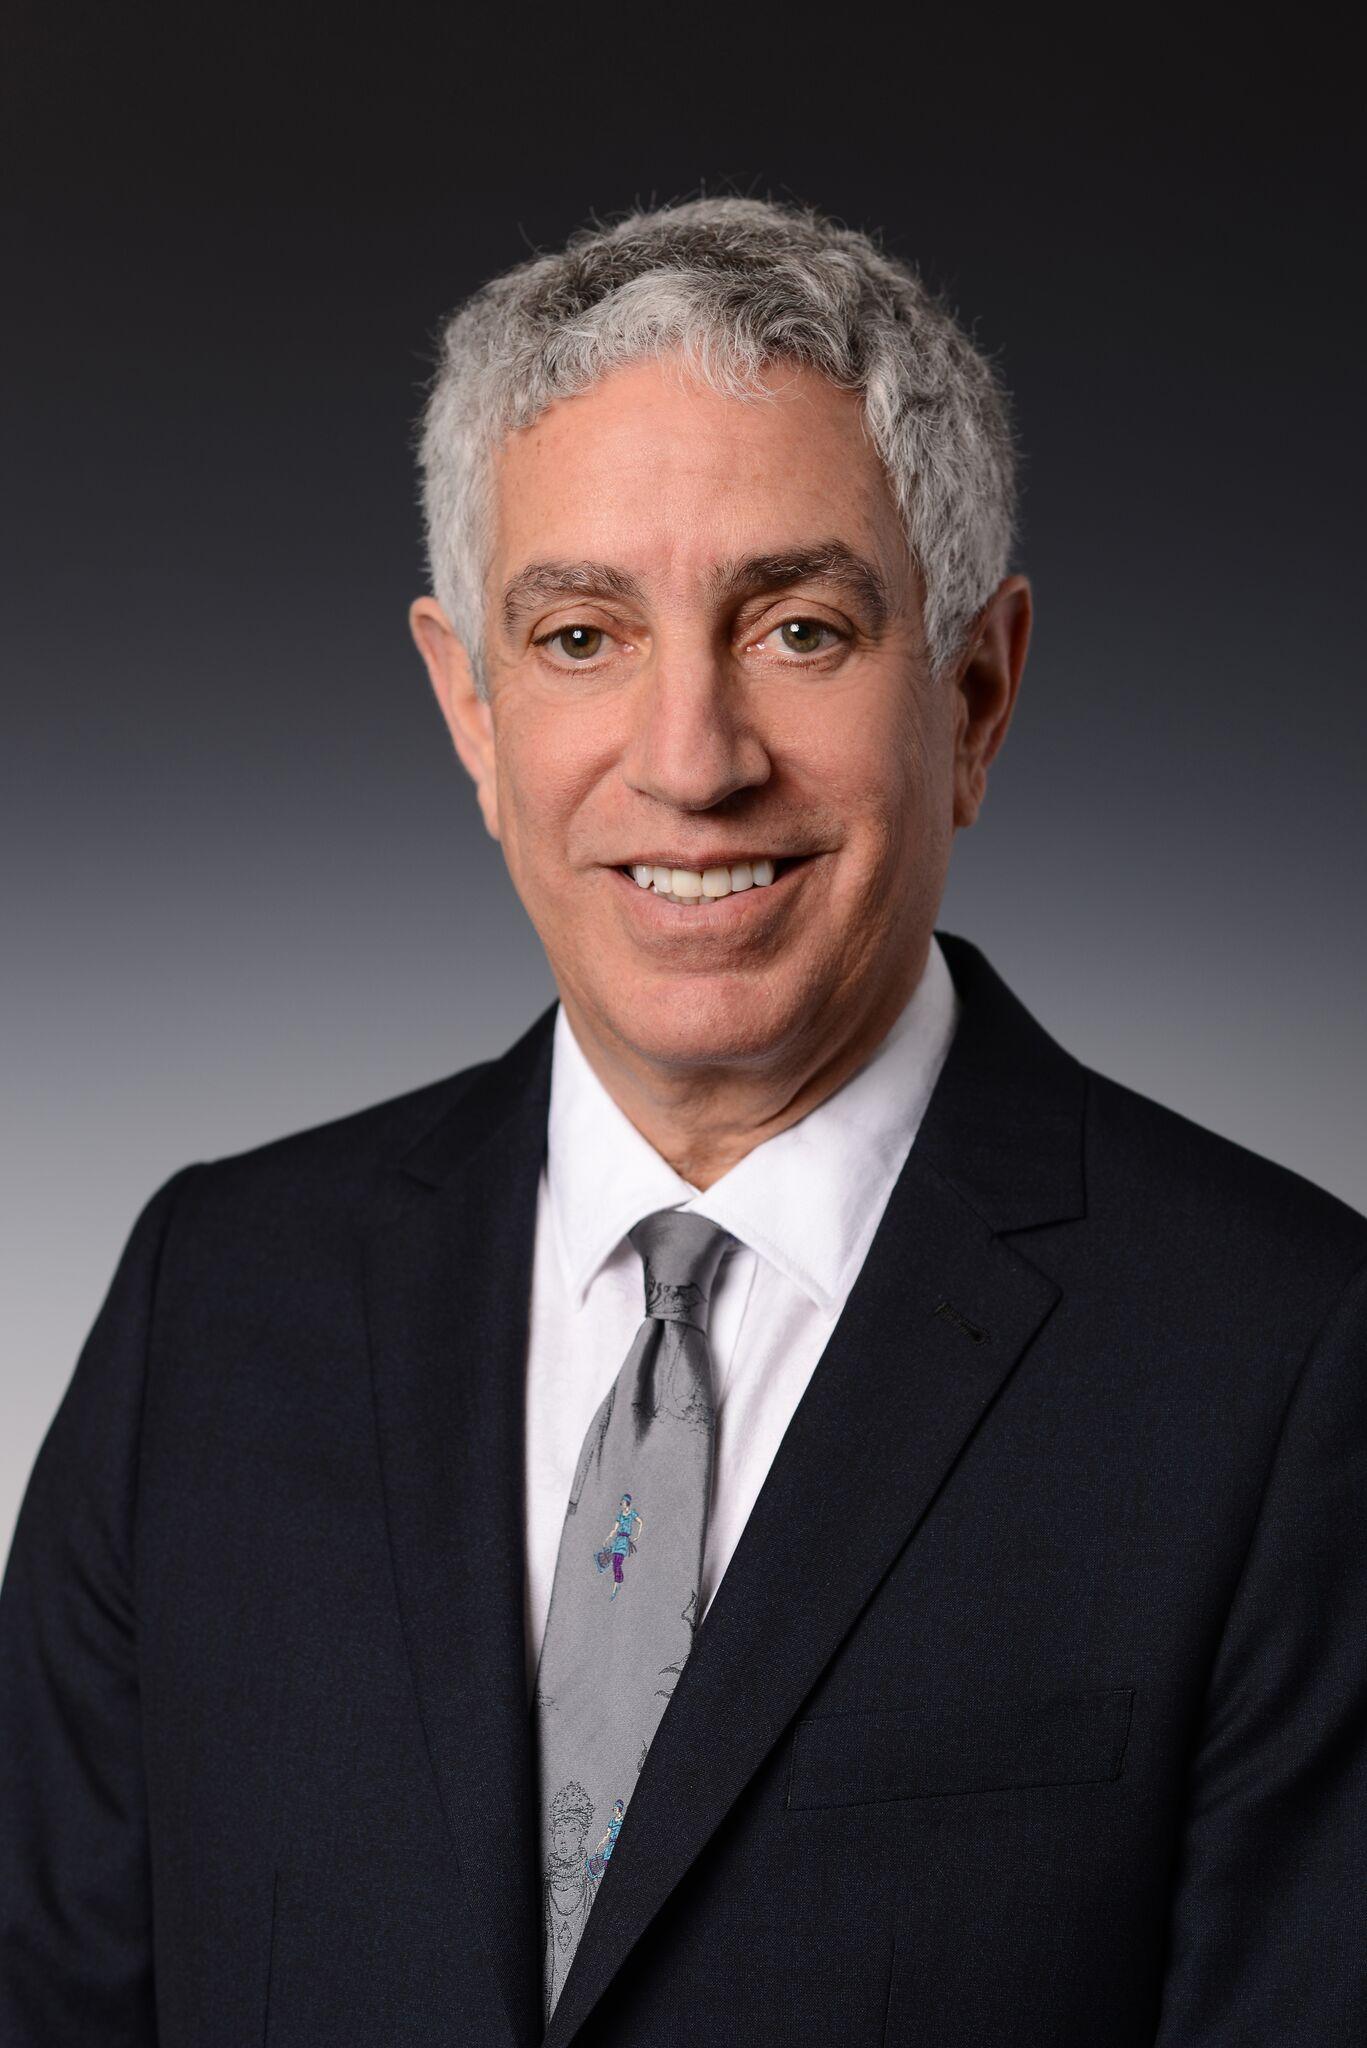 Bruce Halpryn, PhD, CEO/Co-Founder Eikonoklastes Therapeutics